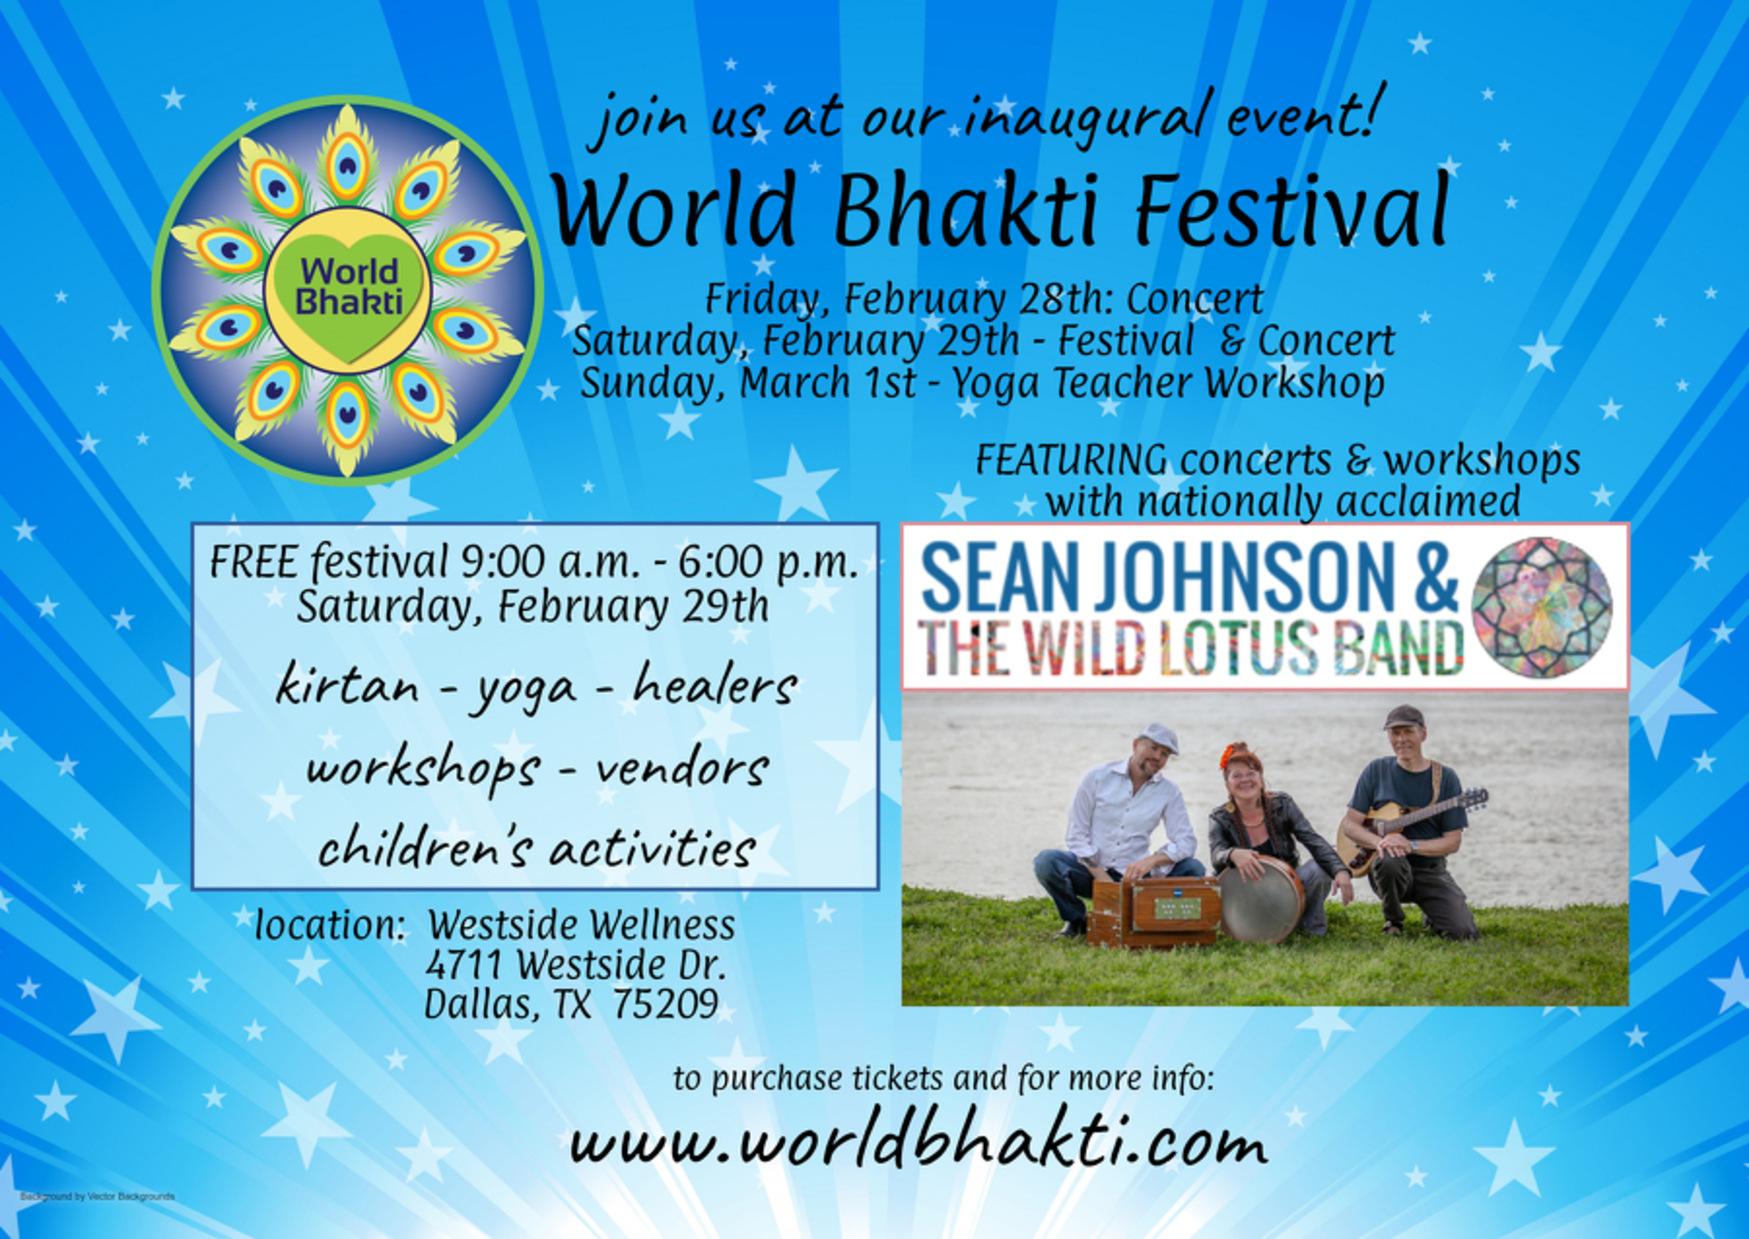 World Bhakti Yoga Festival Featuring Sean Johnson The Wild Lotus Band Community Impact Newspaper